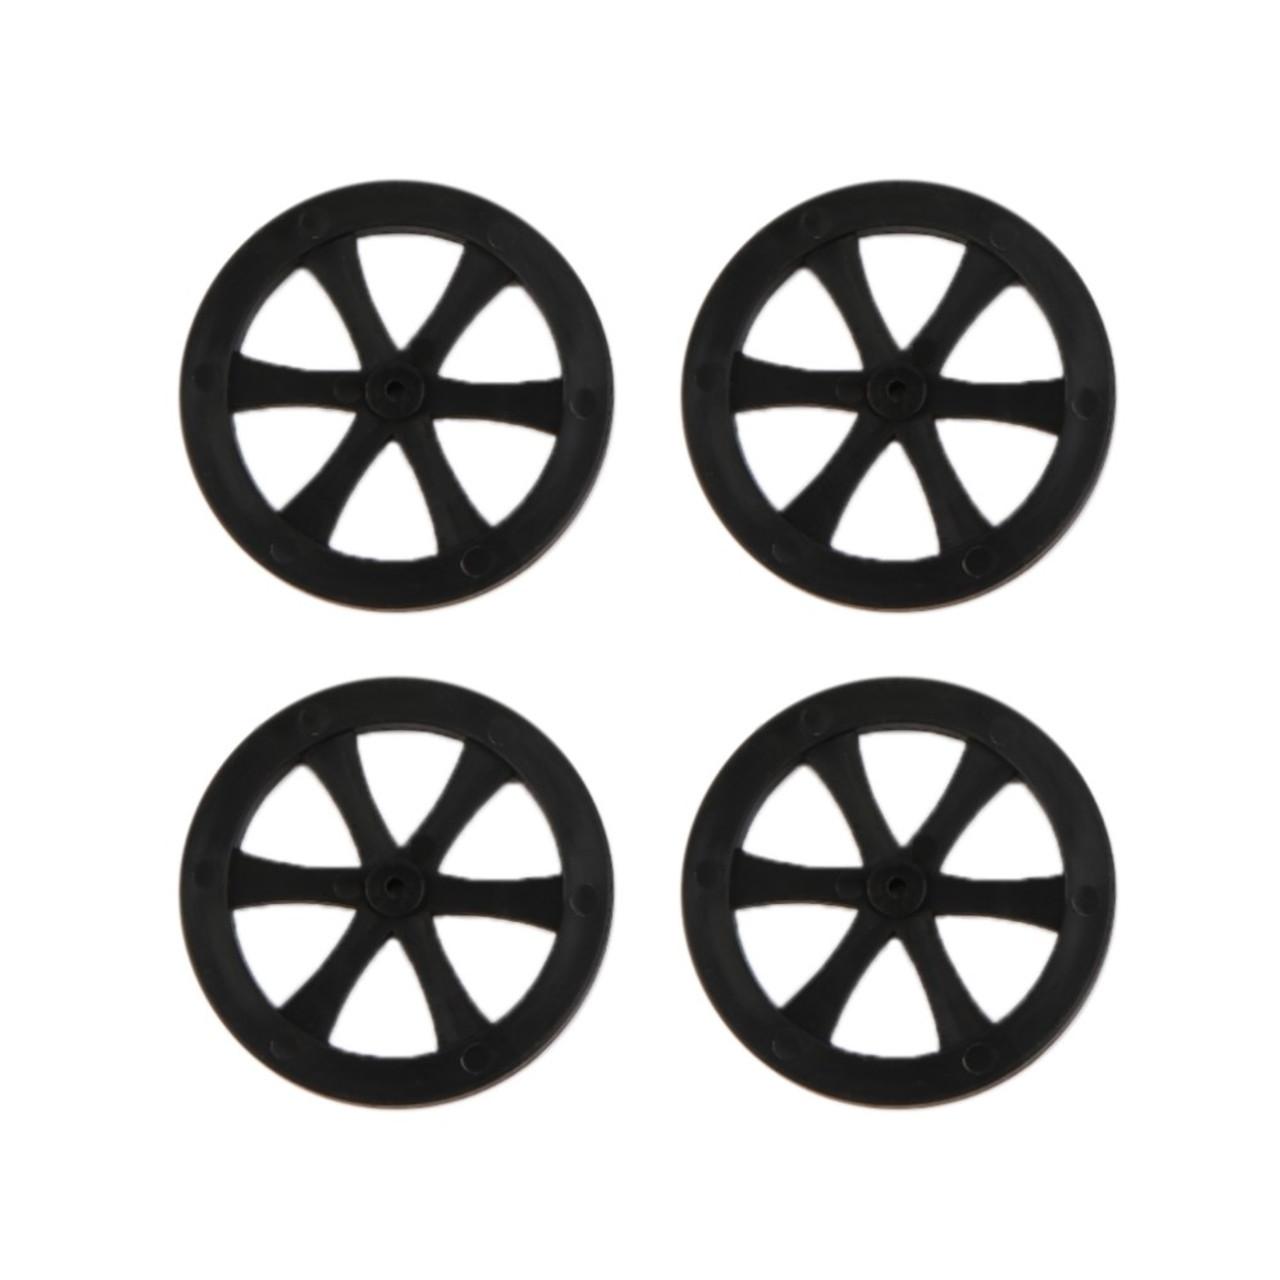 Plastic wheels